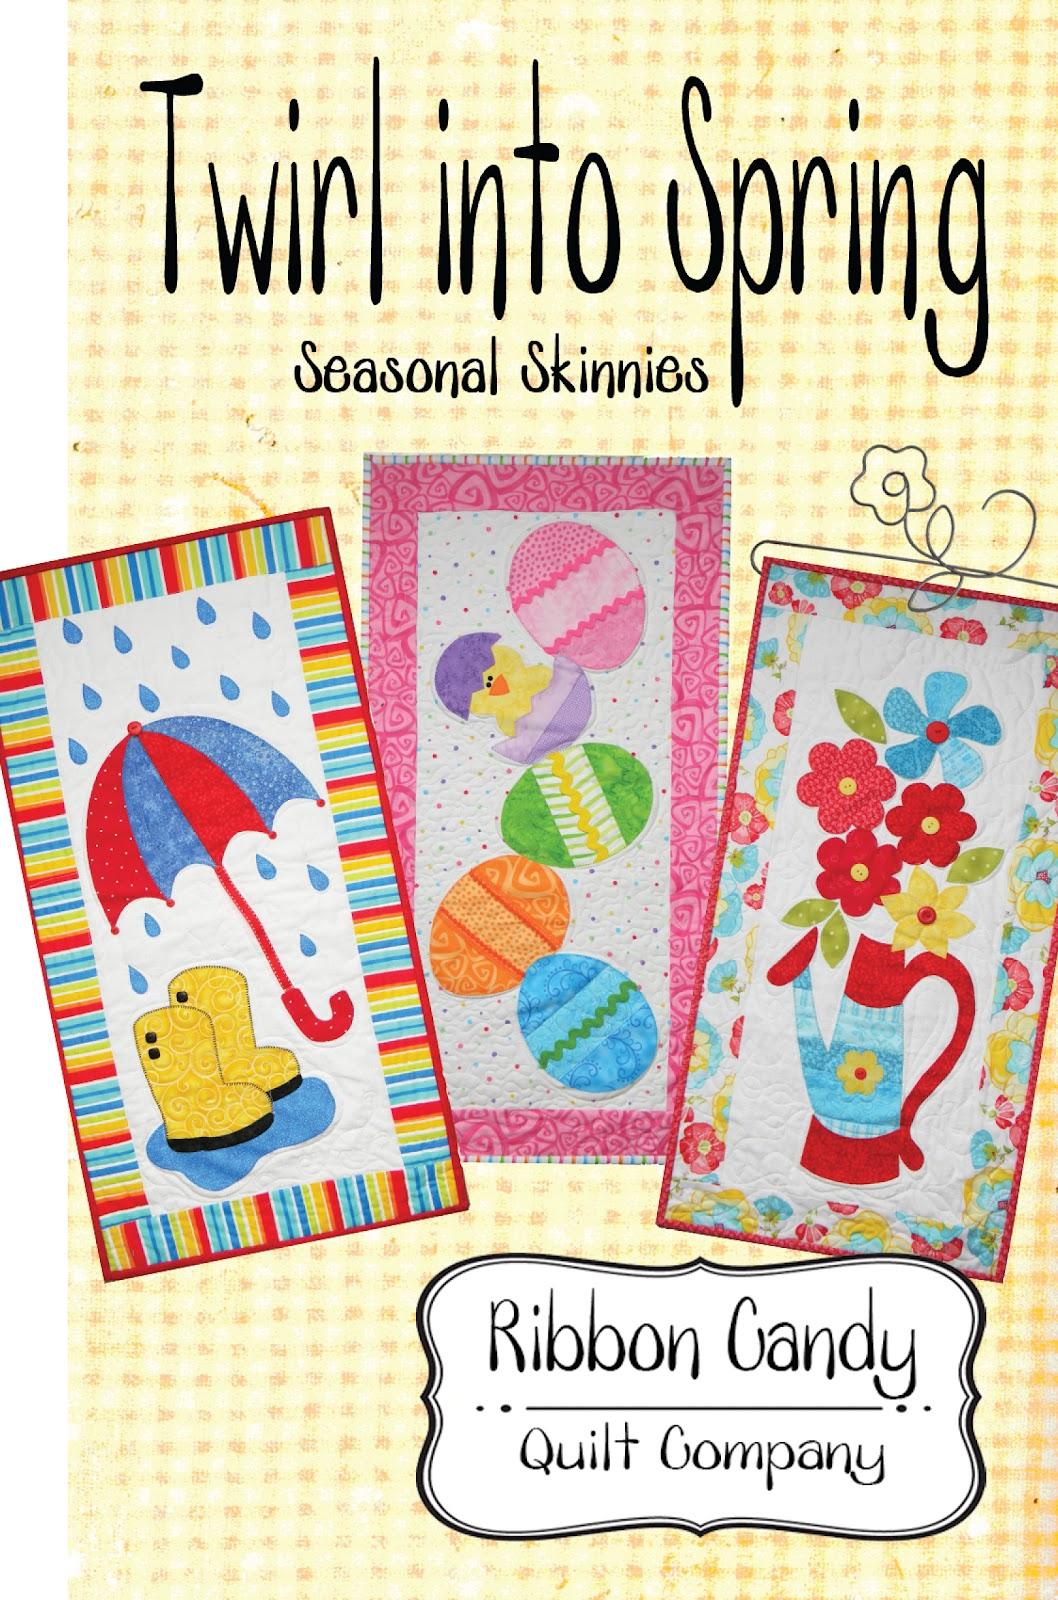 Ribbon Candy Quilt Company: New Seasonal Skinnies : ribbon candy quilt - Adamdwight.com